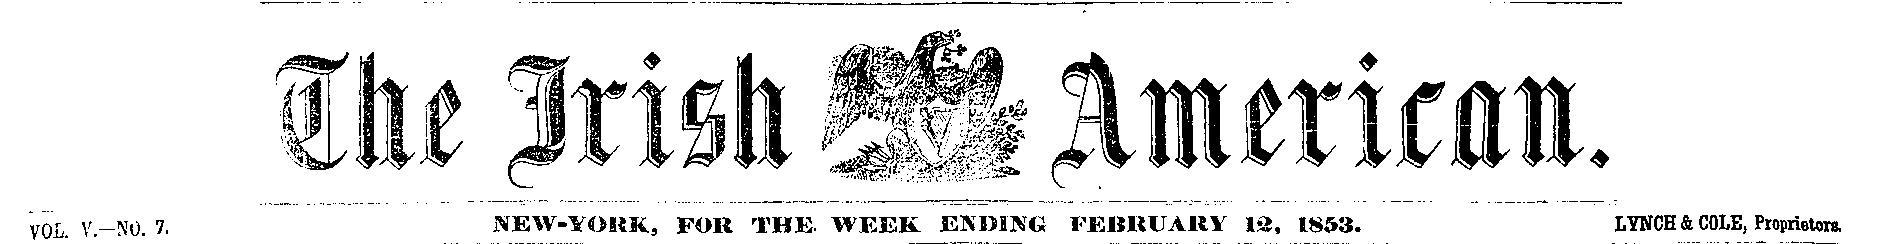 Irish American Weekly masthead-page-001